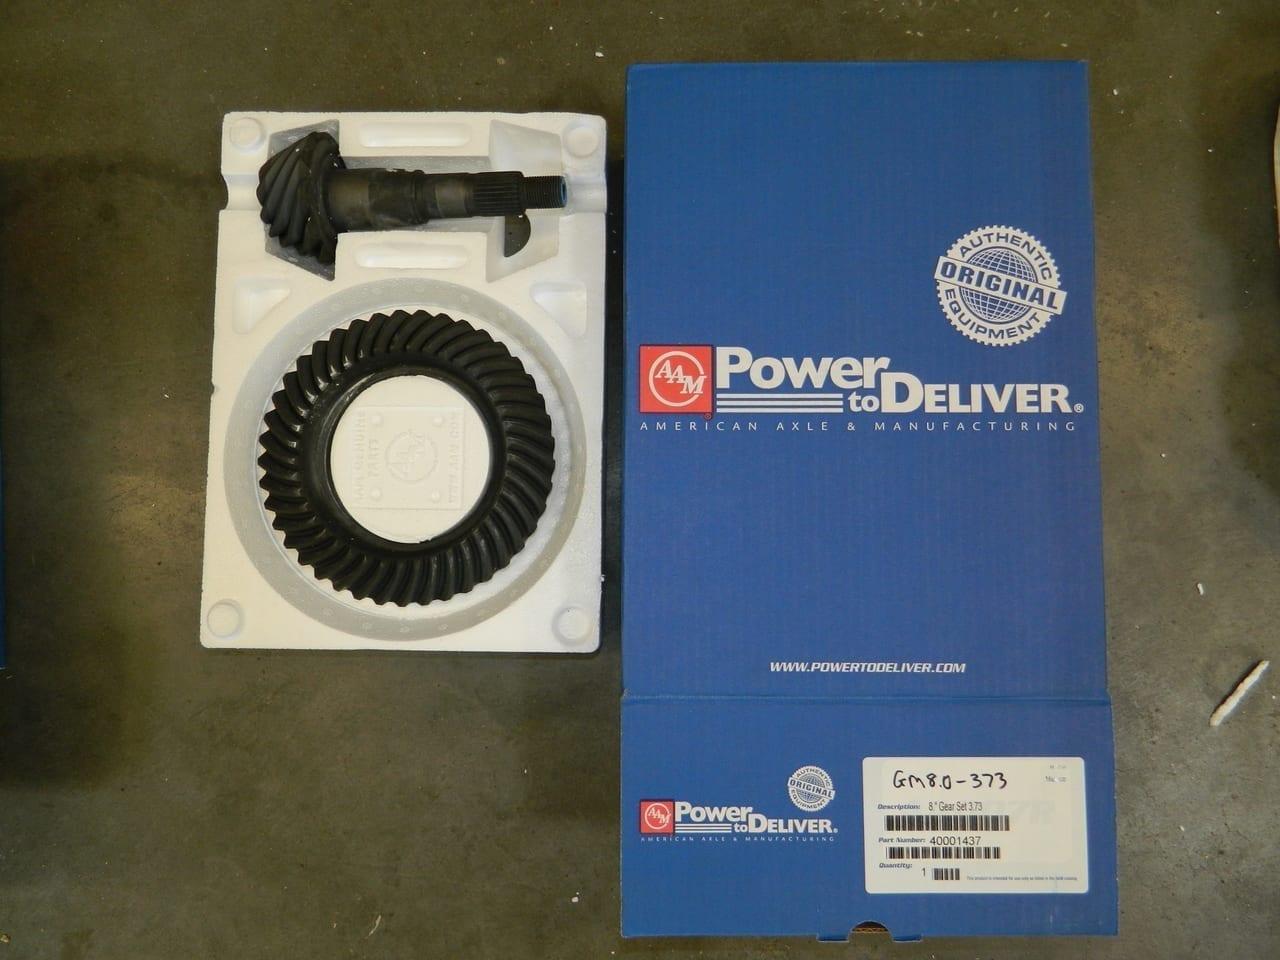 GM8.0-373 OEM Ring Gear and Pinion Set 2002+ Envoy Trailblazer Chevy GMC Rear